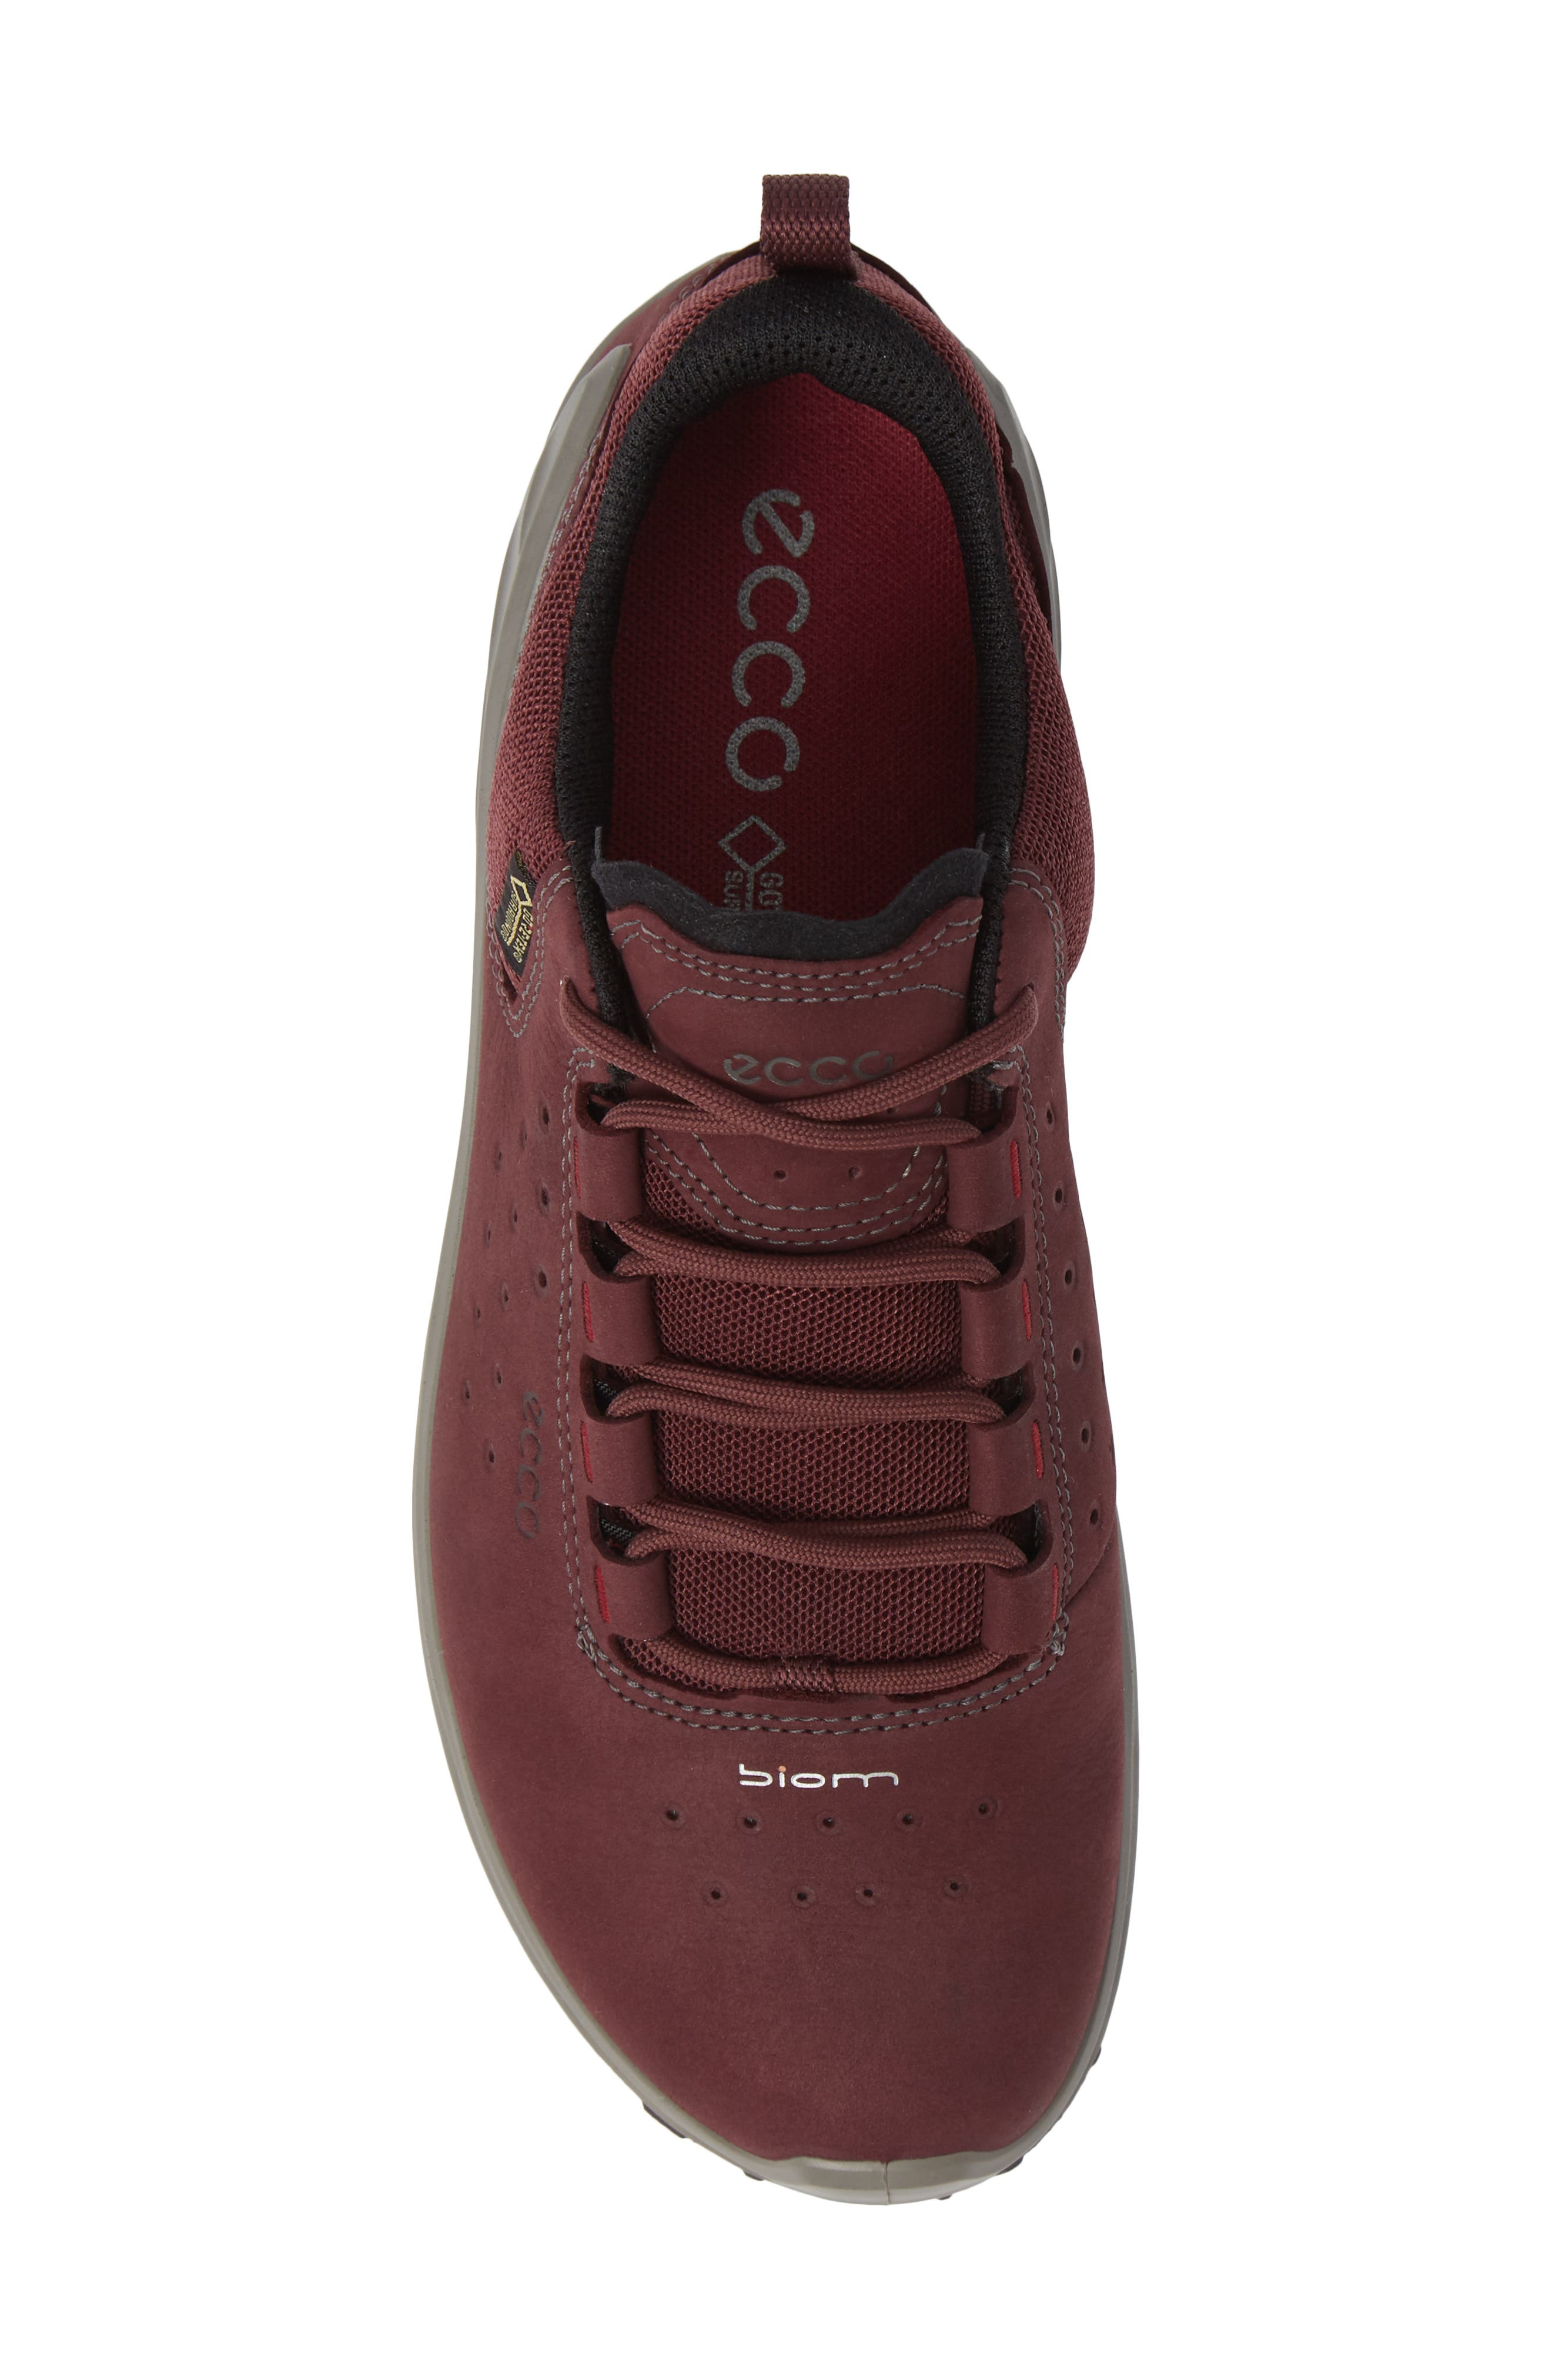 BIOM Venture GTX Sneaker,                             Alternate thumbnail 5, color,                             WINE NUBUCK LEATHER